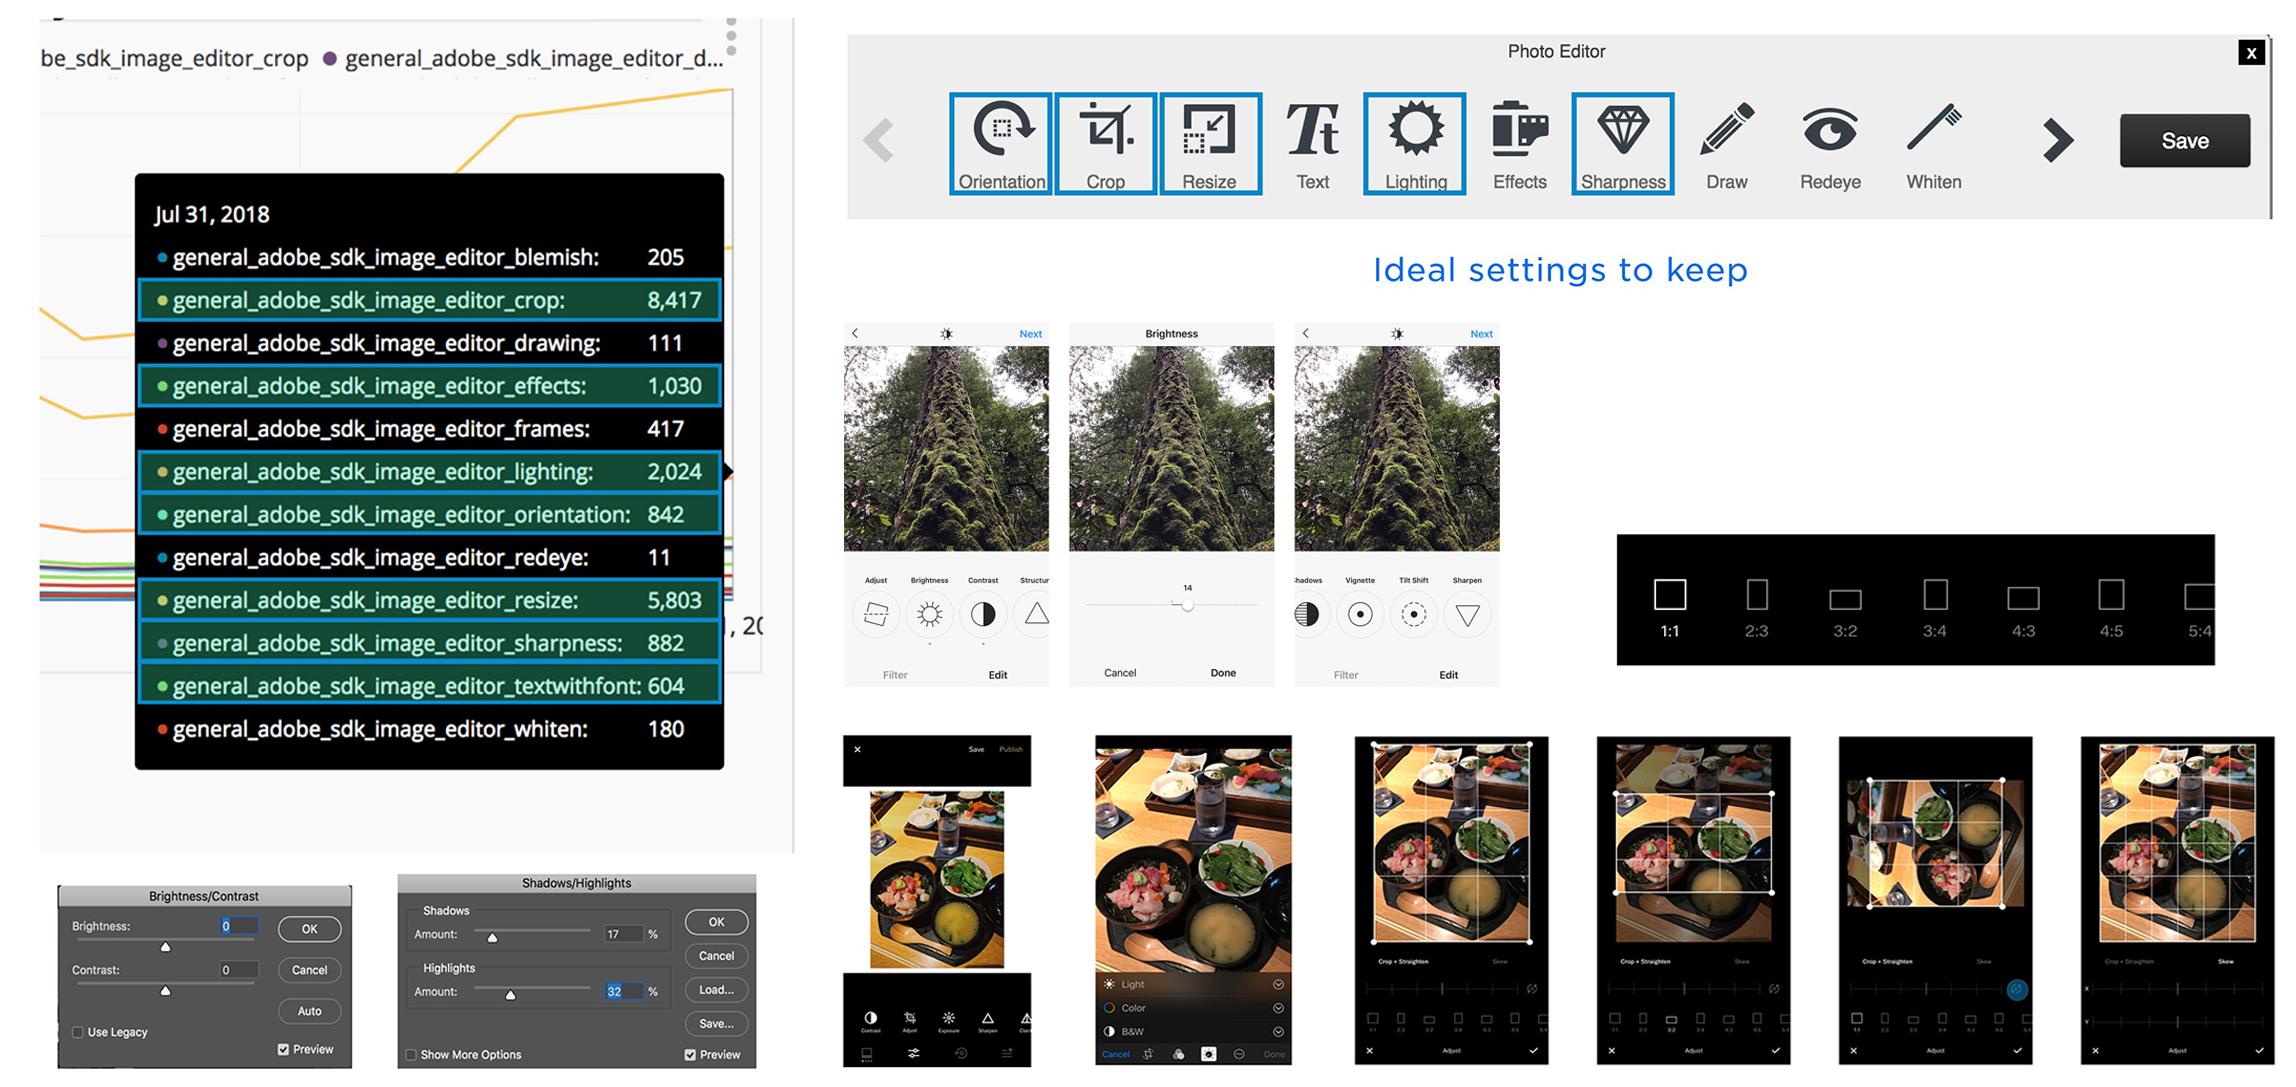 Image Editor_Data.jpg